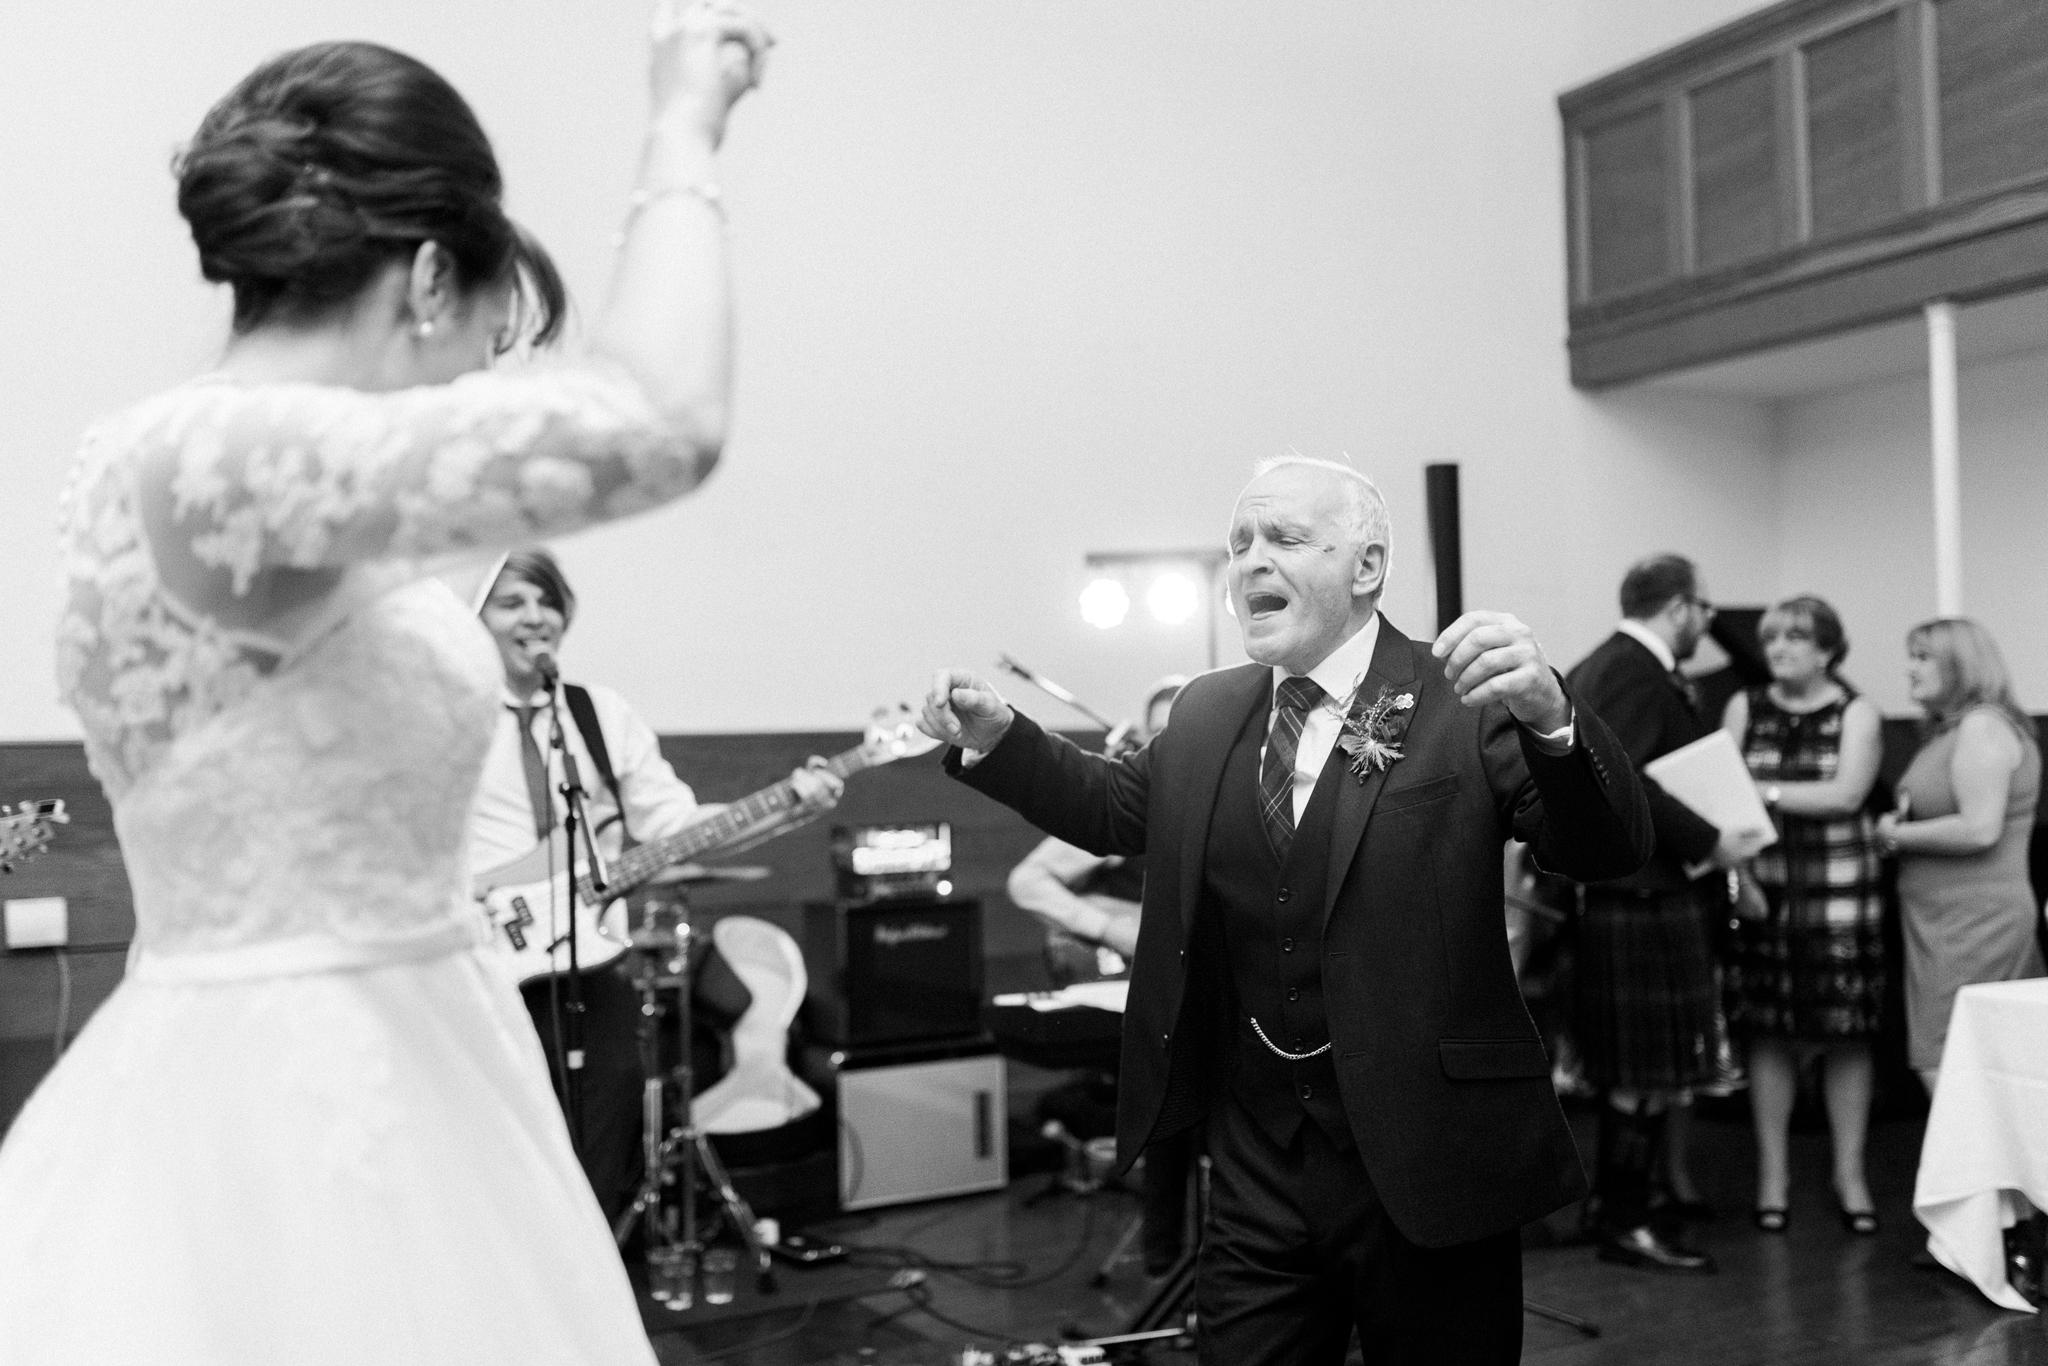 114-desination-wedding-photographer-scotland.jpg